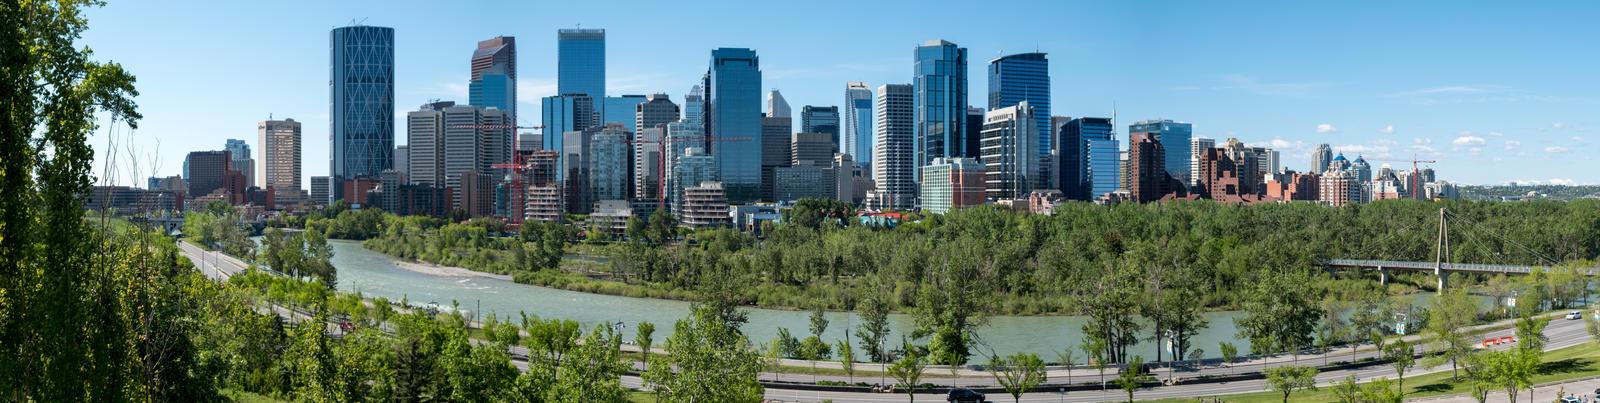 Calgary by the3dman